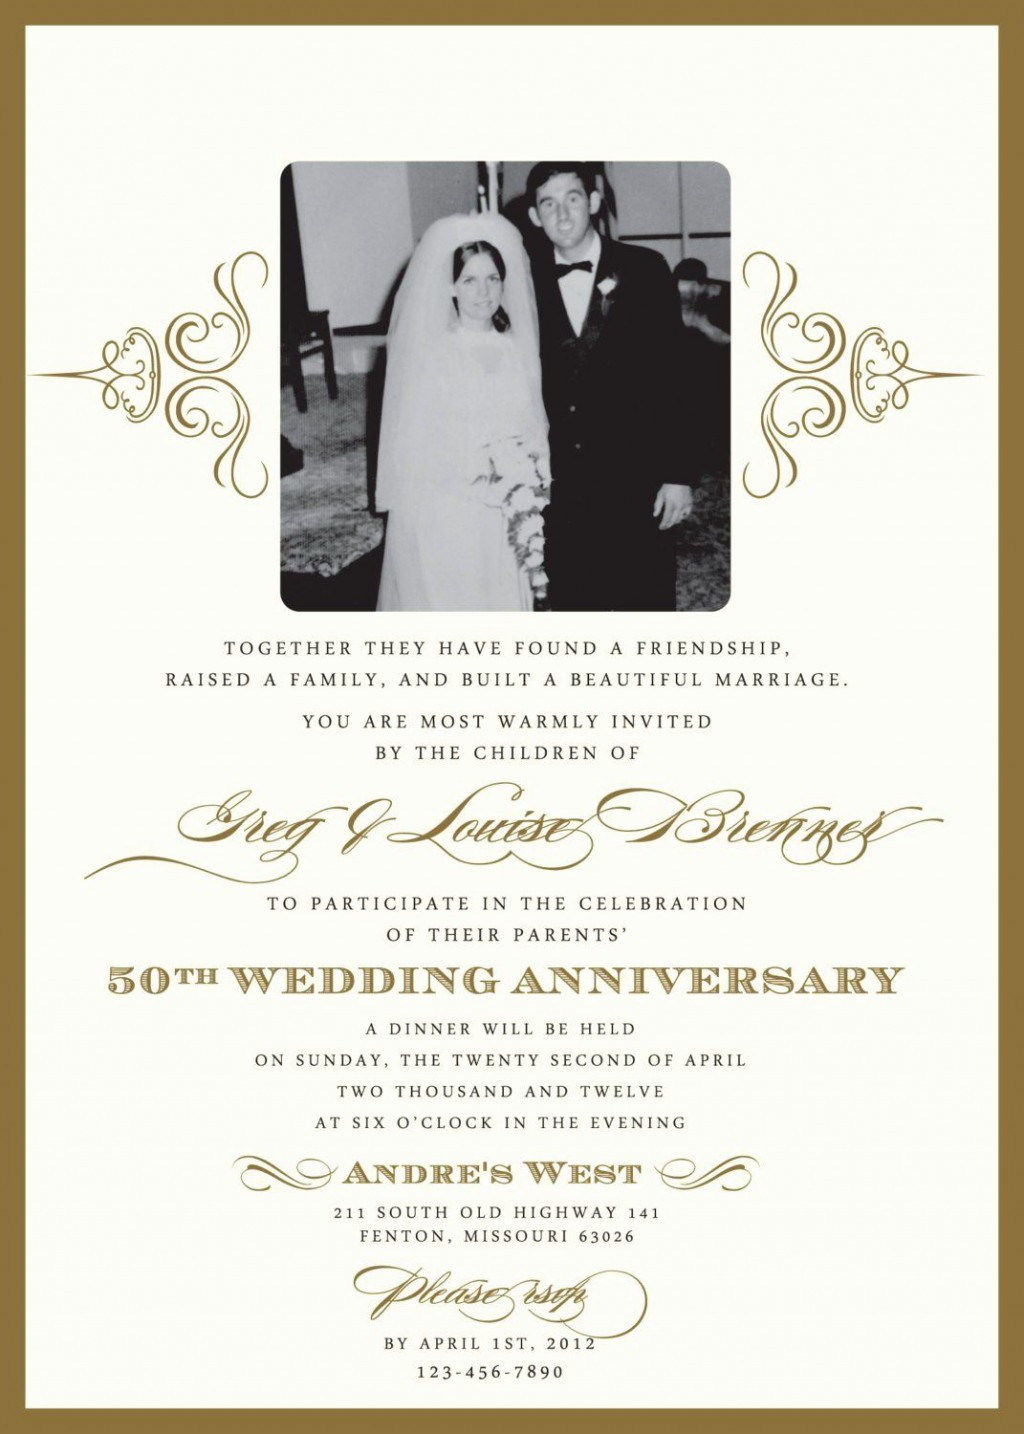 002 Impressive 50th Wedding Anniversary Invitation Template Free Highest Quality  Download Golden Microsoft WordLarge